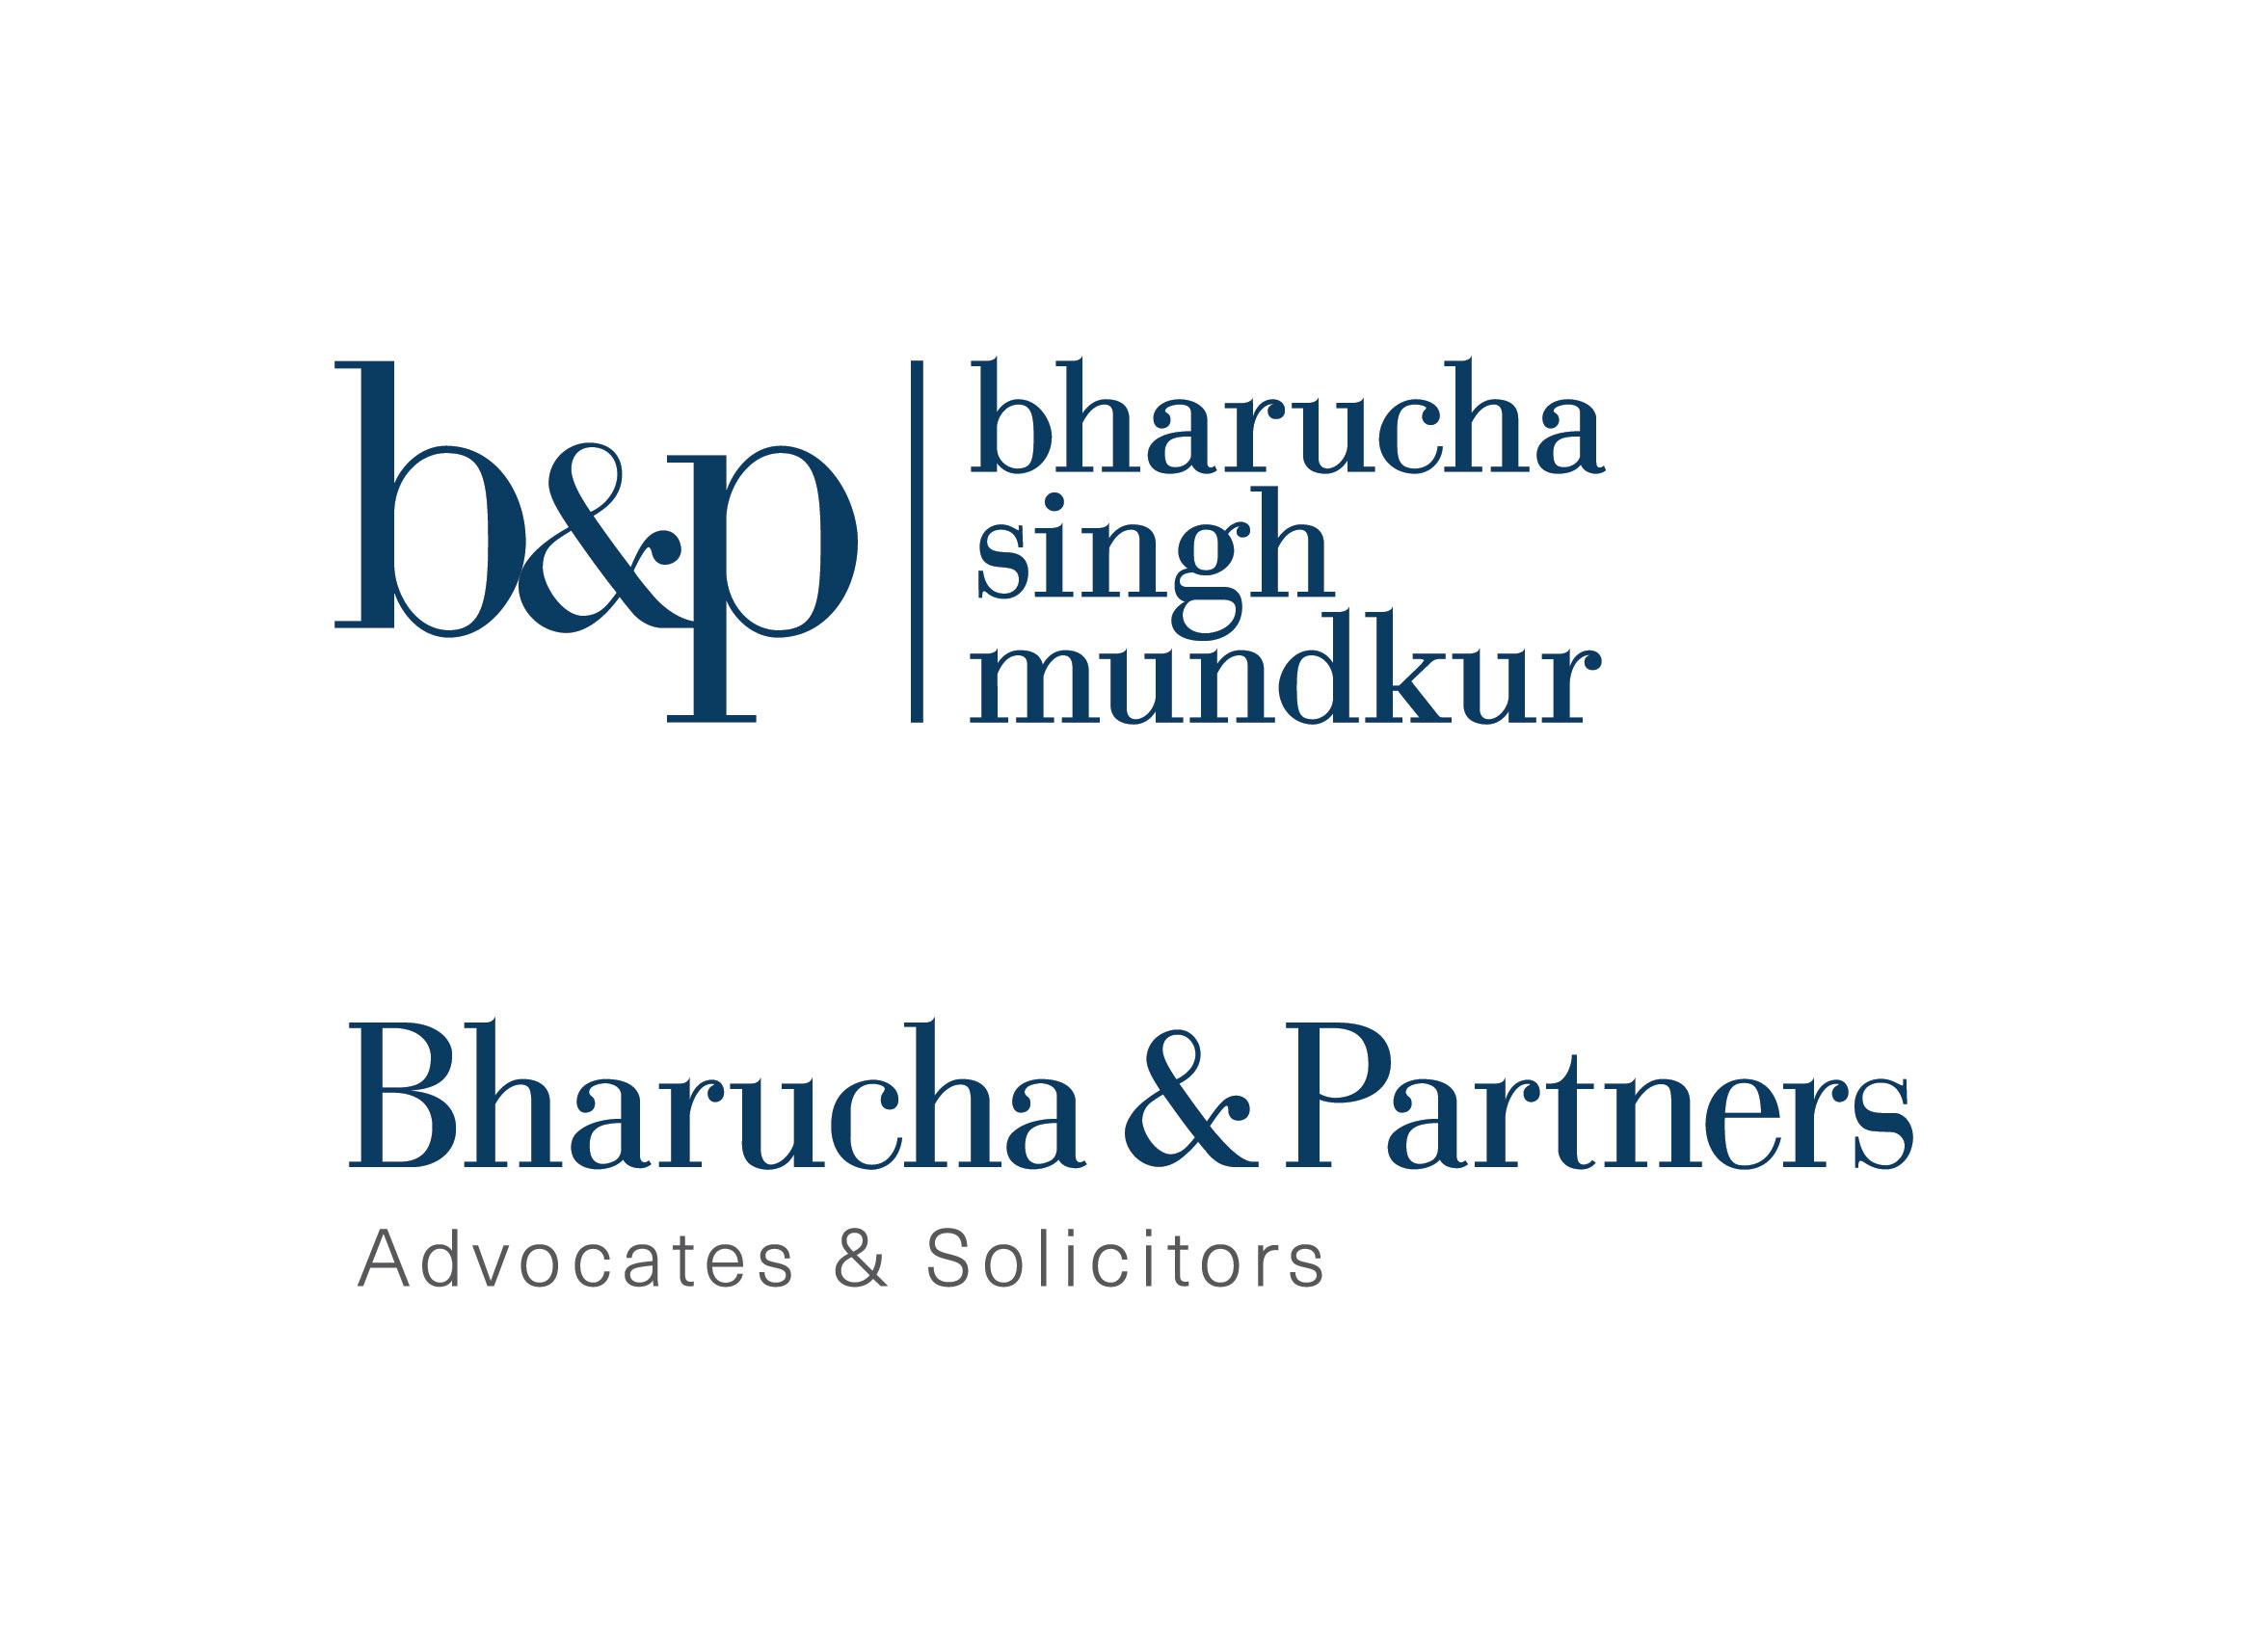 Bharucha Singh Mundkur